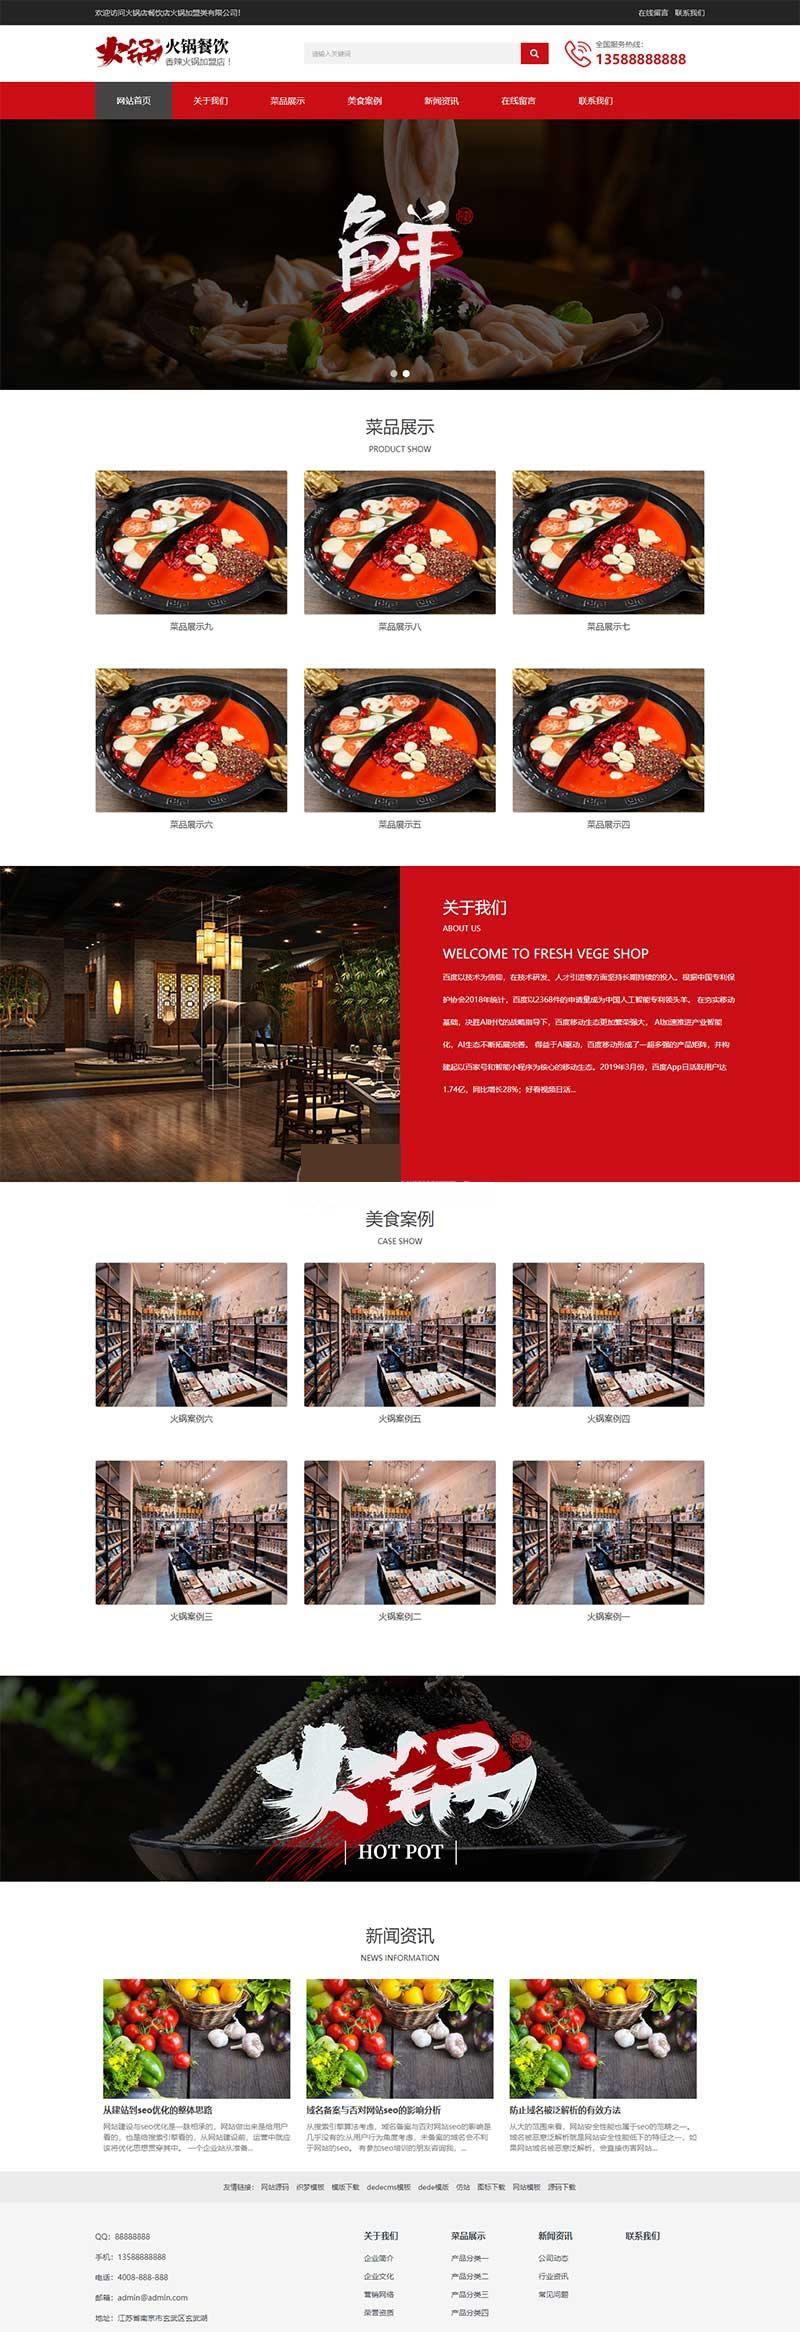 【DEDECMS模板】HTML5响应式火锅餐饮加盟店类网站源码自适应手机版[织梦内核]-酷网站源码